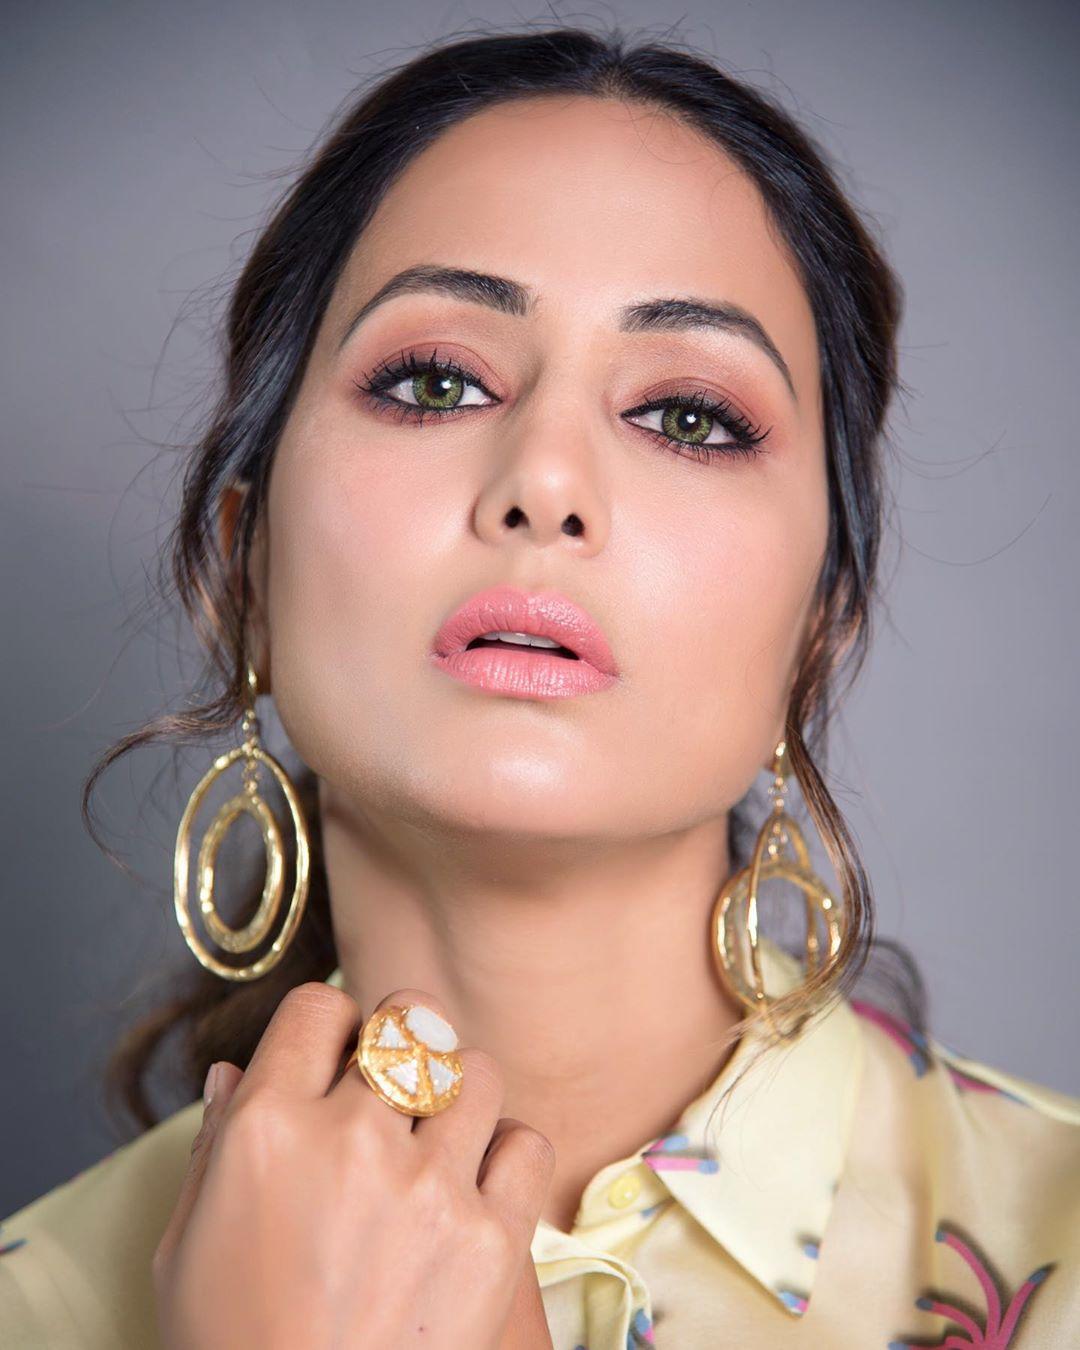 Bollywood Tadka, हिना खान इमेज, हिना खान फोटो, हिना खान पिक्चर,